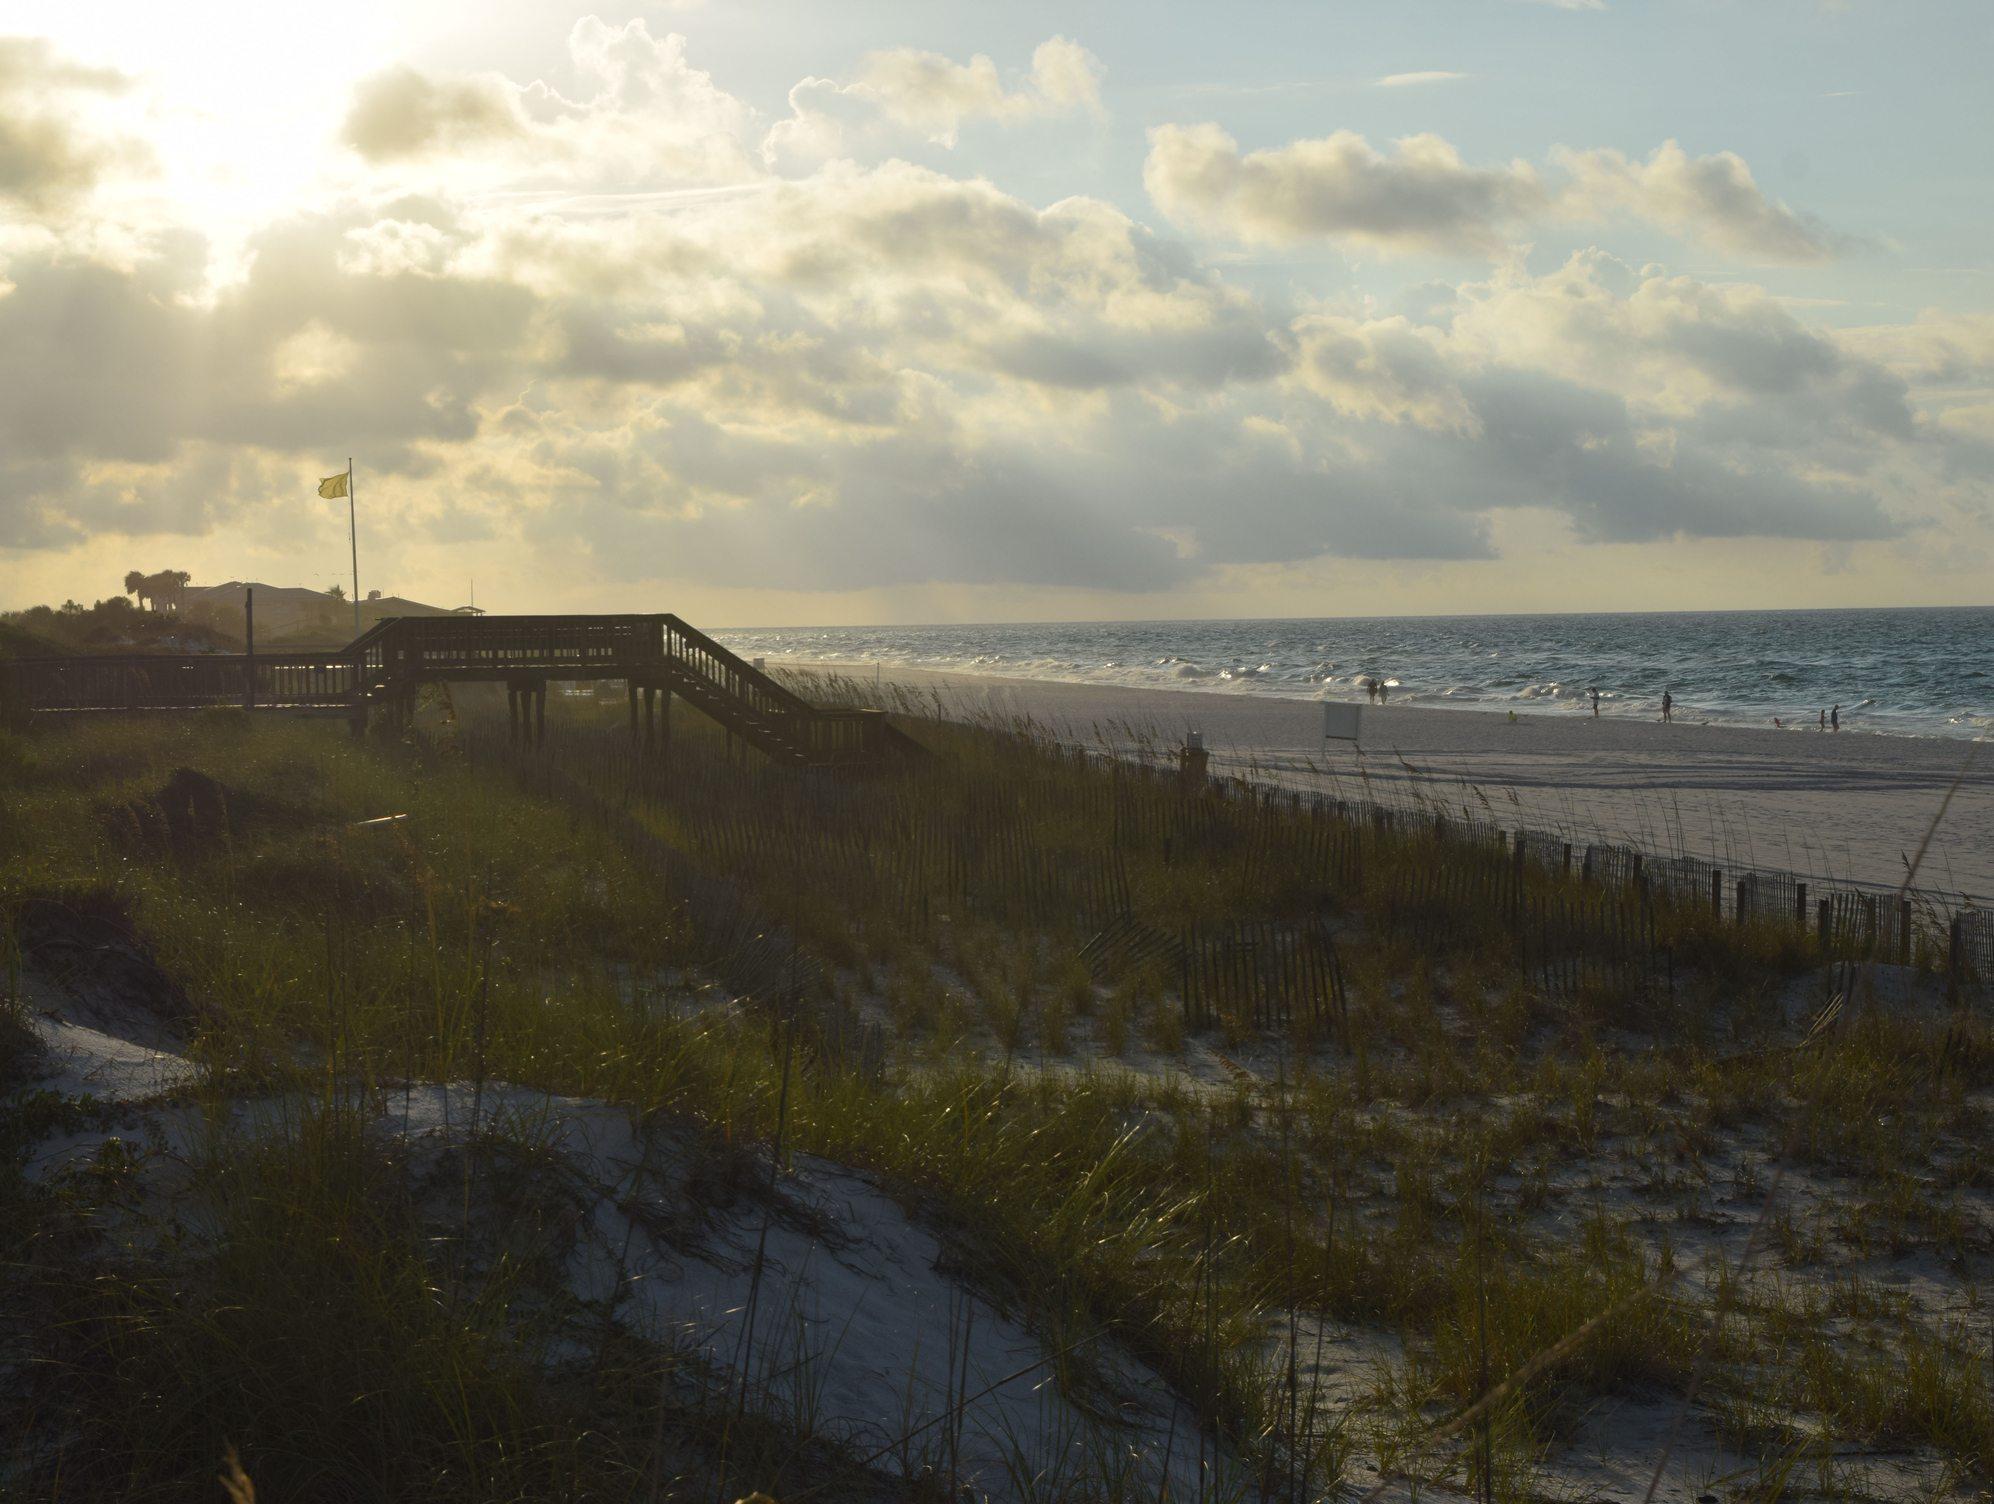 Sunrise in Miramar Beach, Florida.